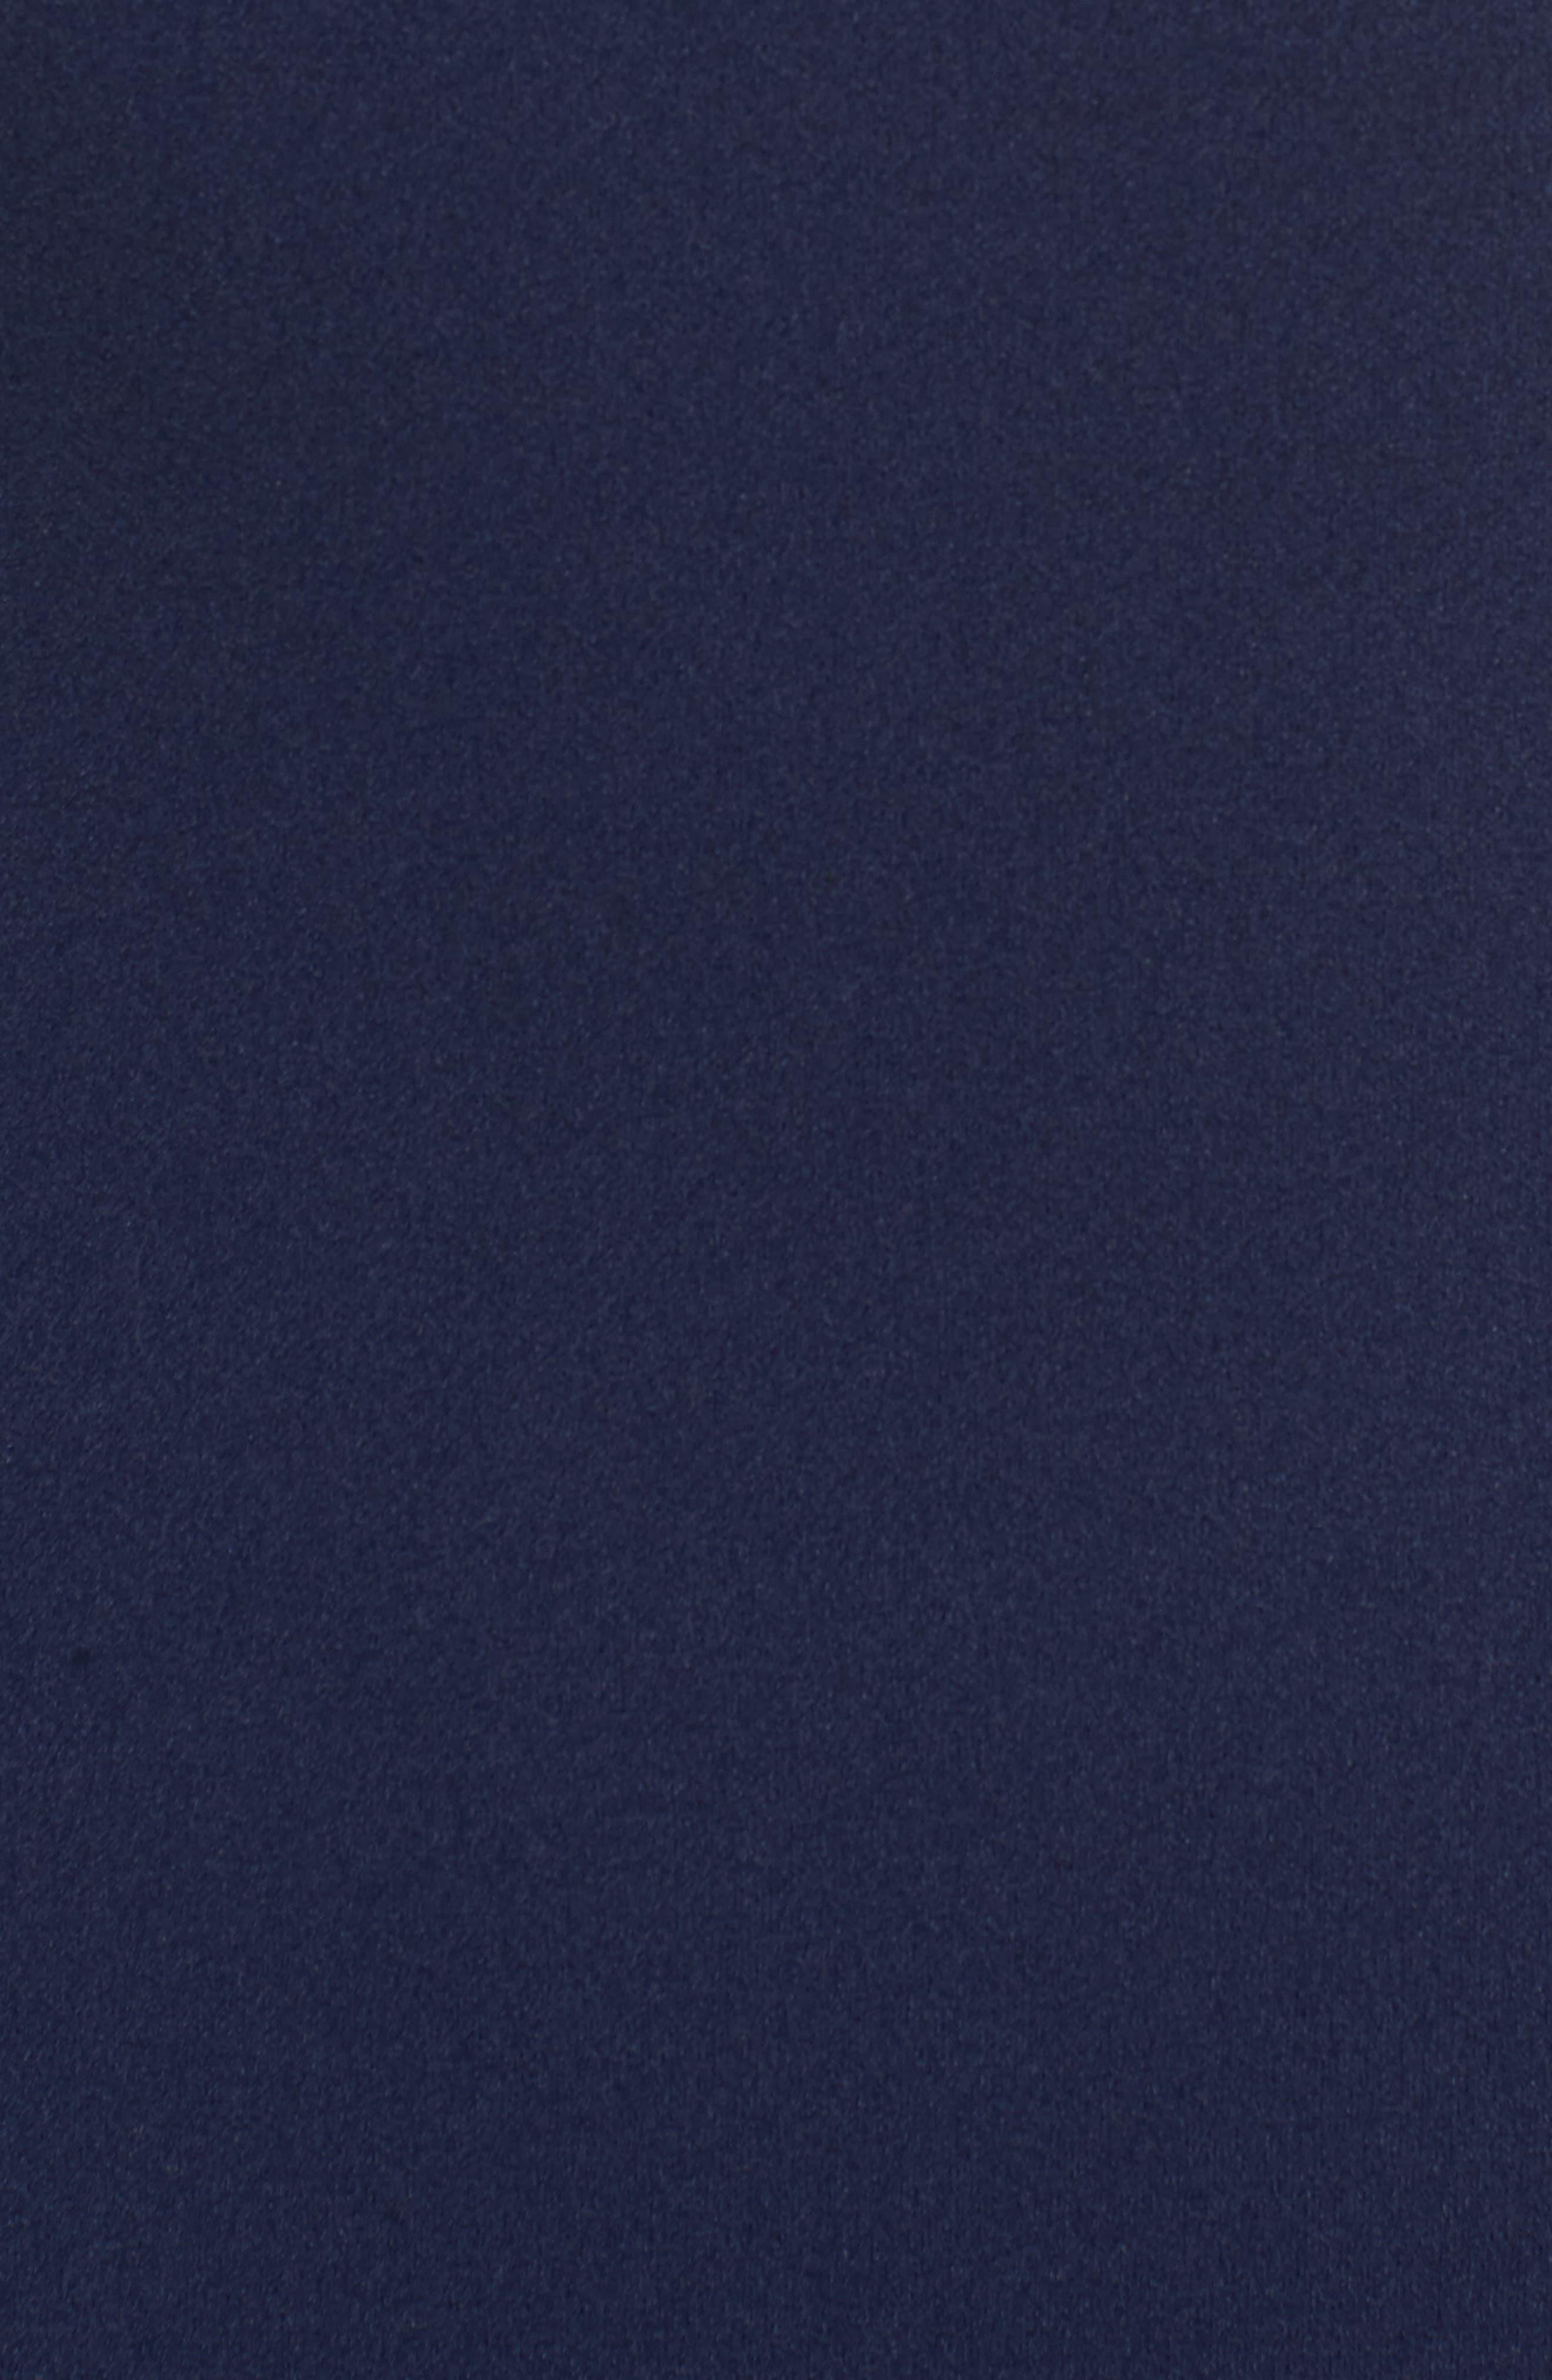 Open Back Sheath Dress,                             Alternate thumbnail 5, color,